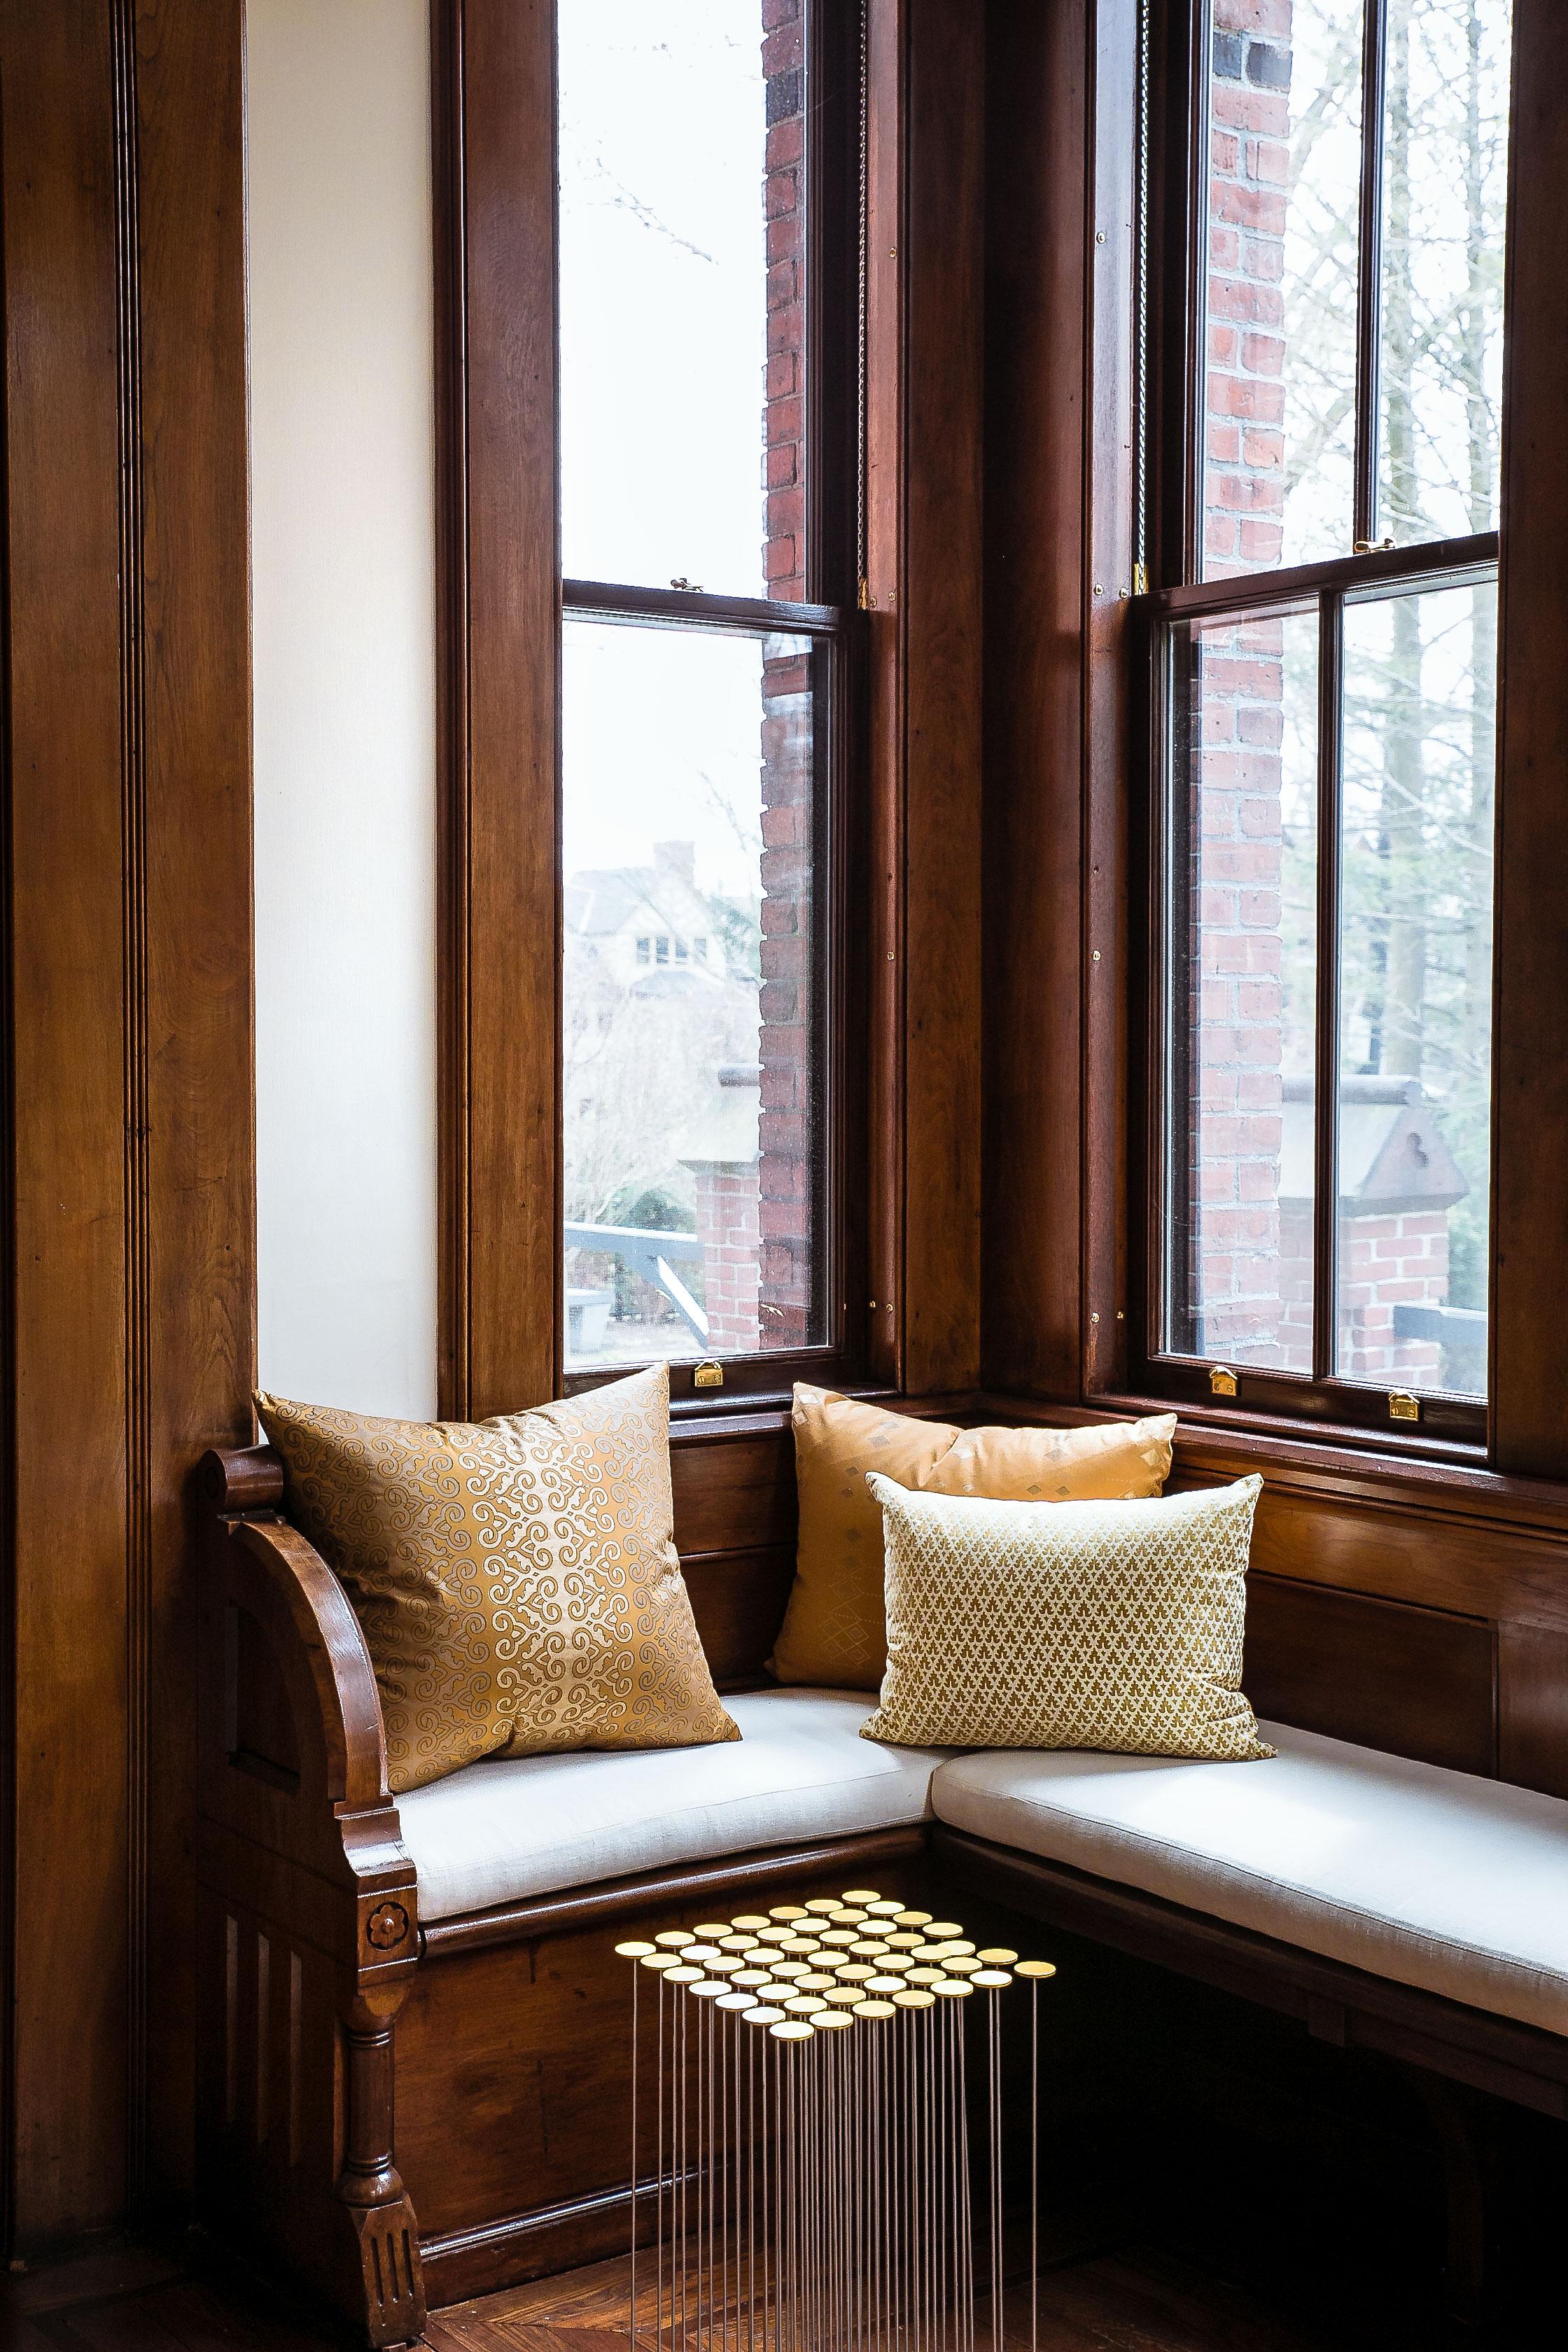 LR2-corner-window-bench.jpg